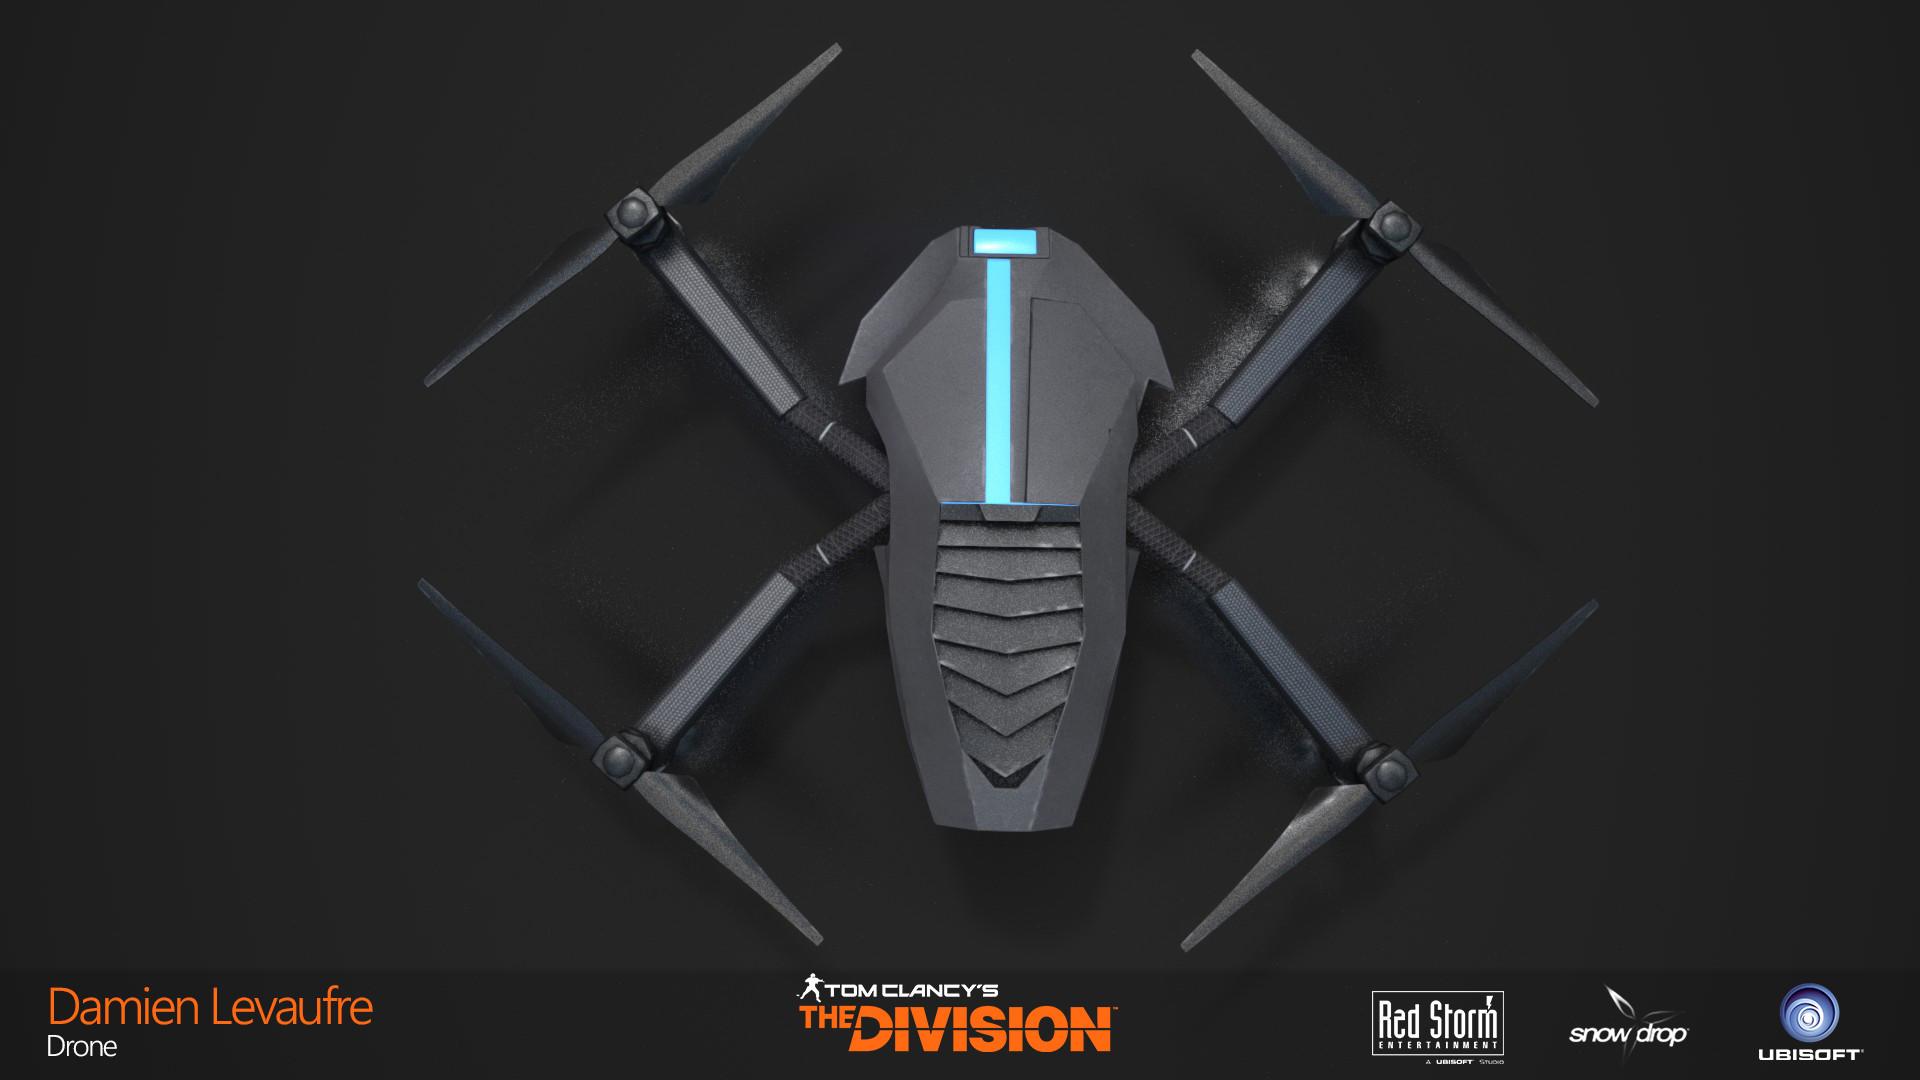 Damien levaufre drone top